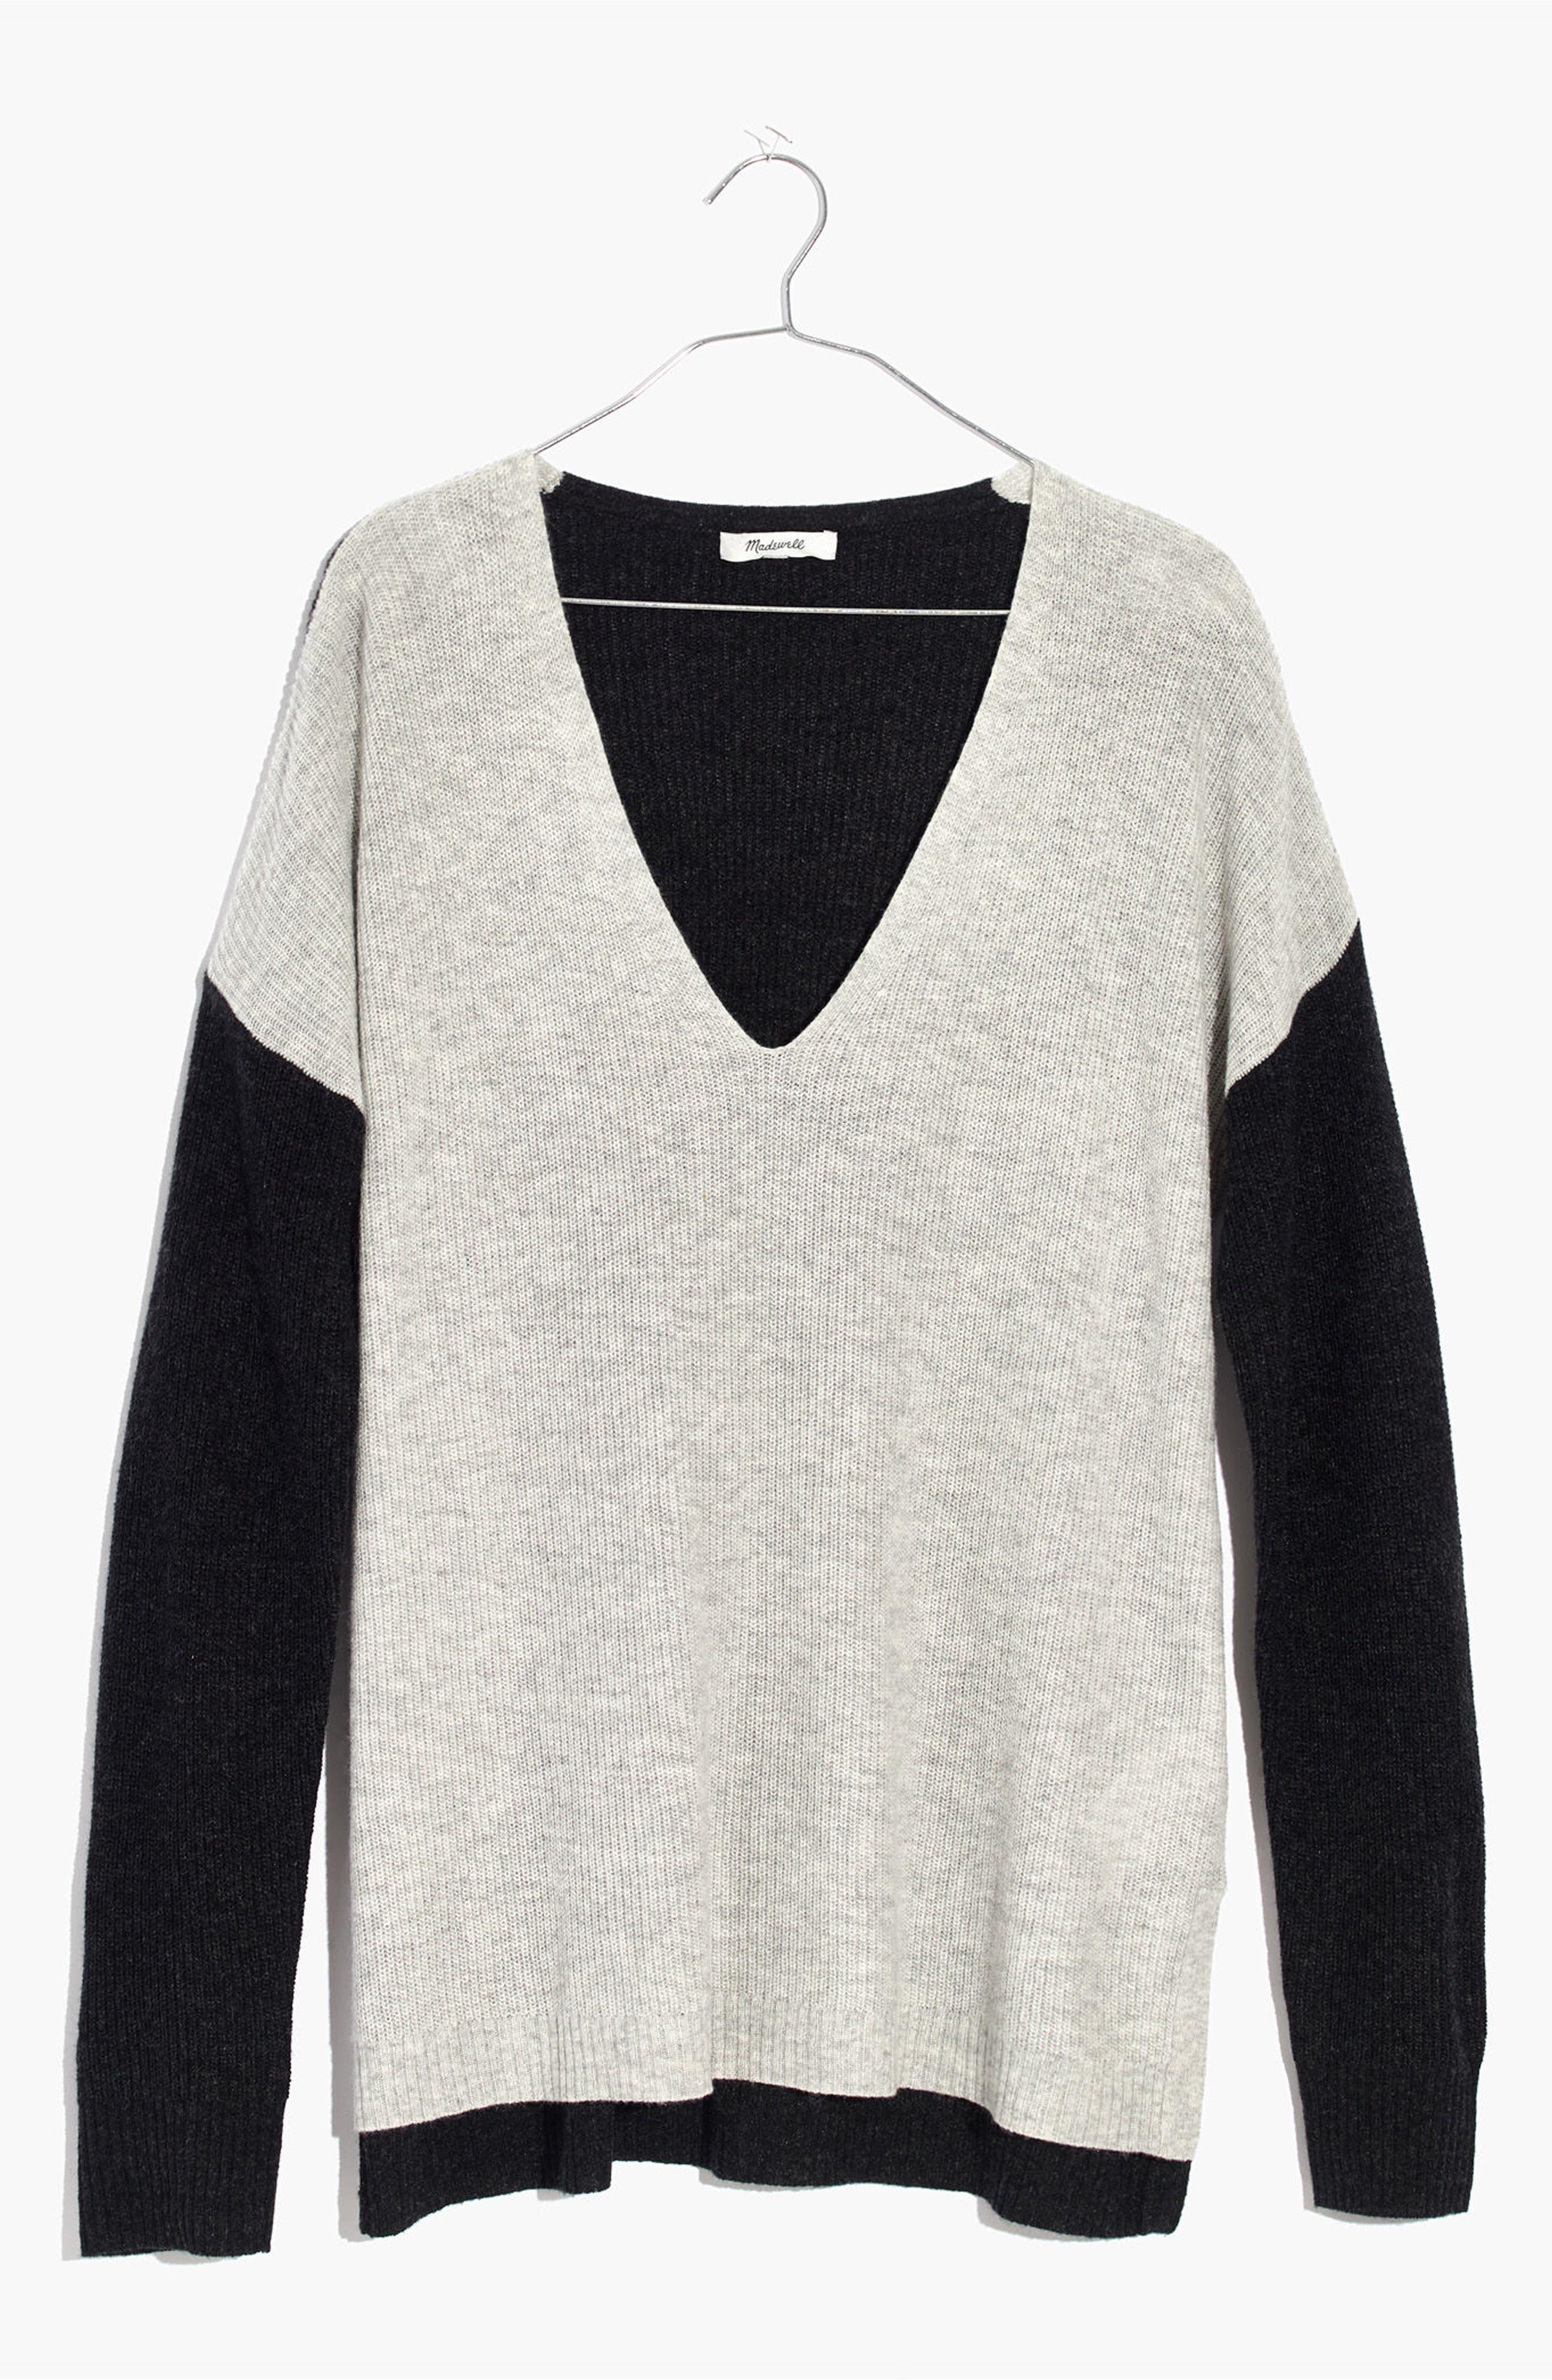 Warmlight Colorblock V-Neck Sweater,                             Alternate thumbnail 3, color,                             090